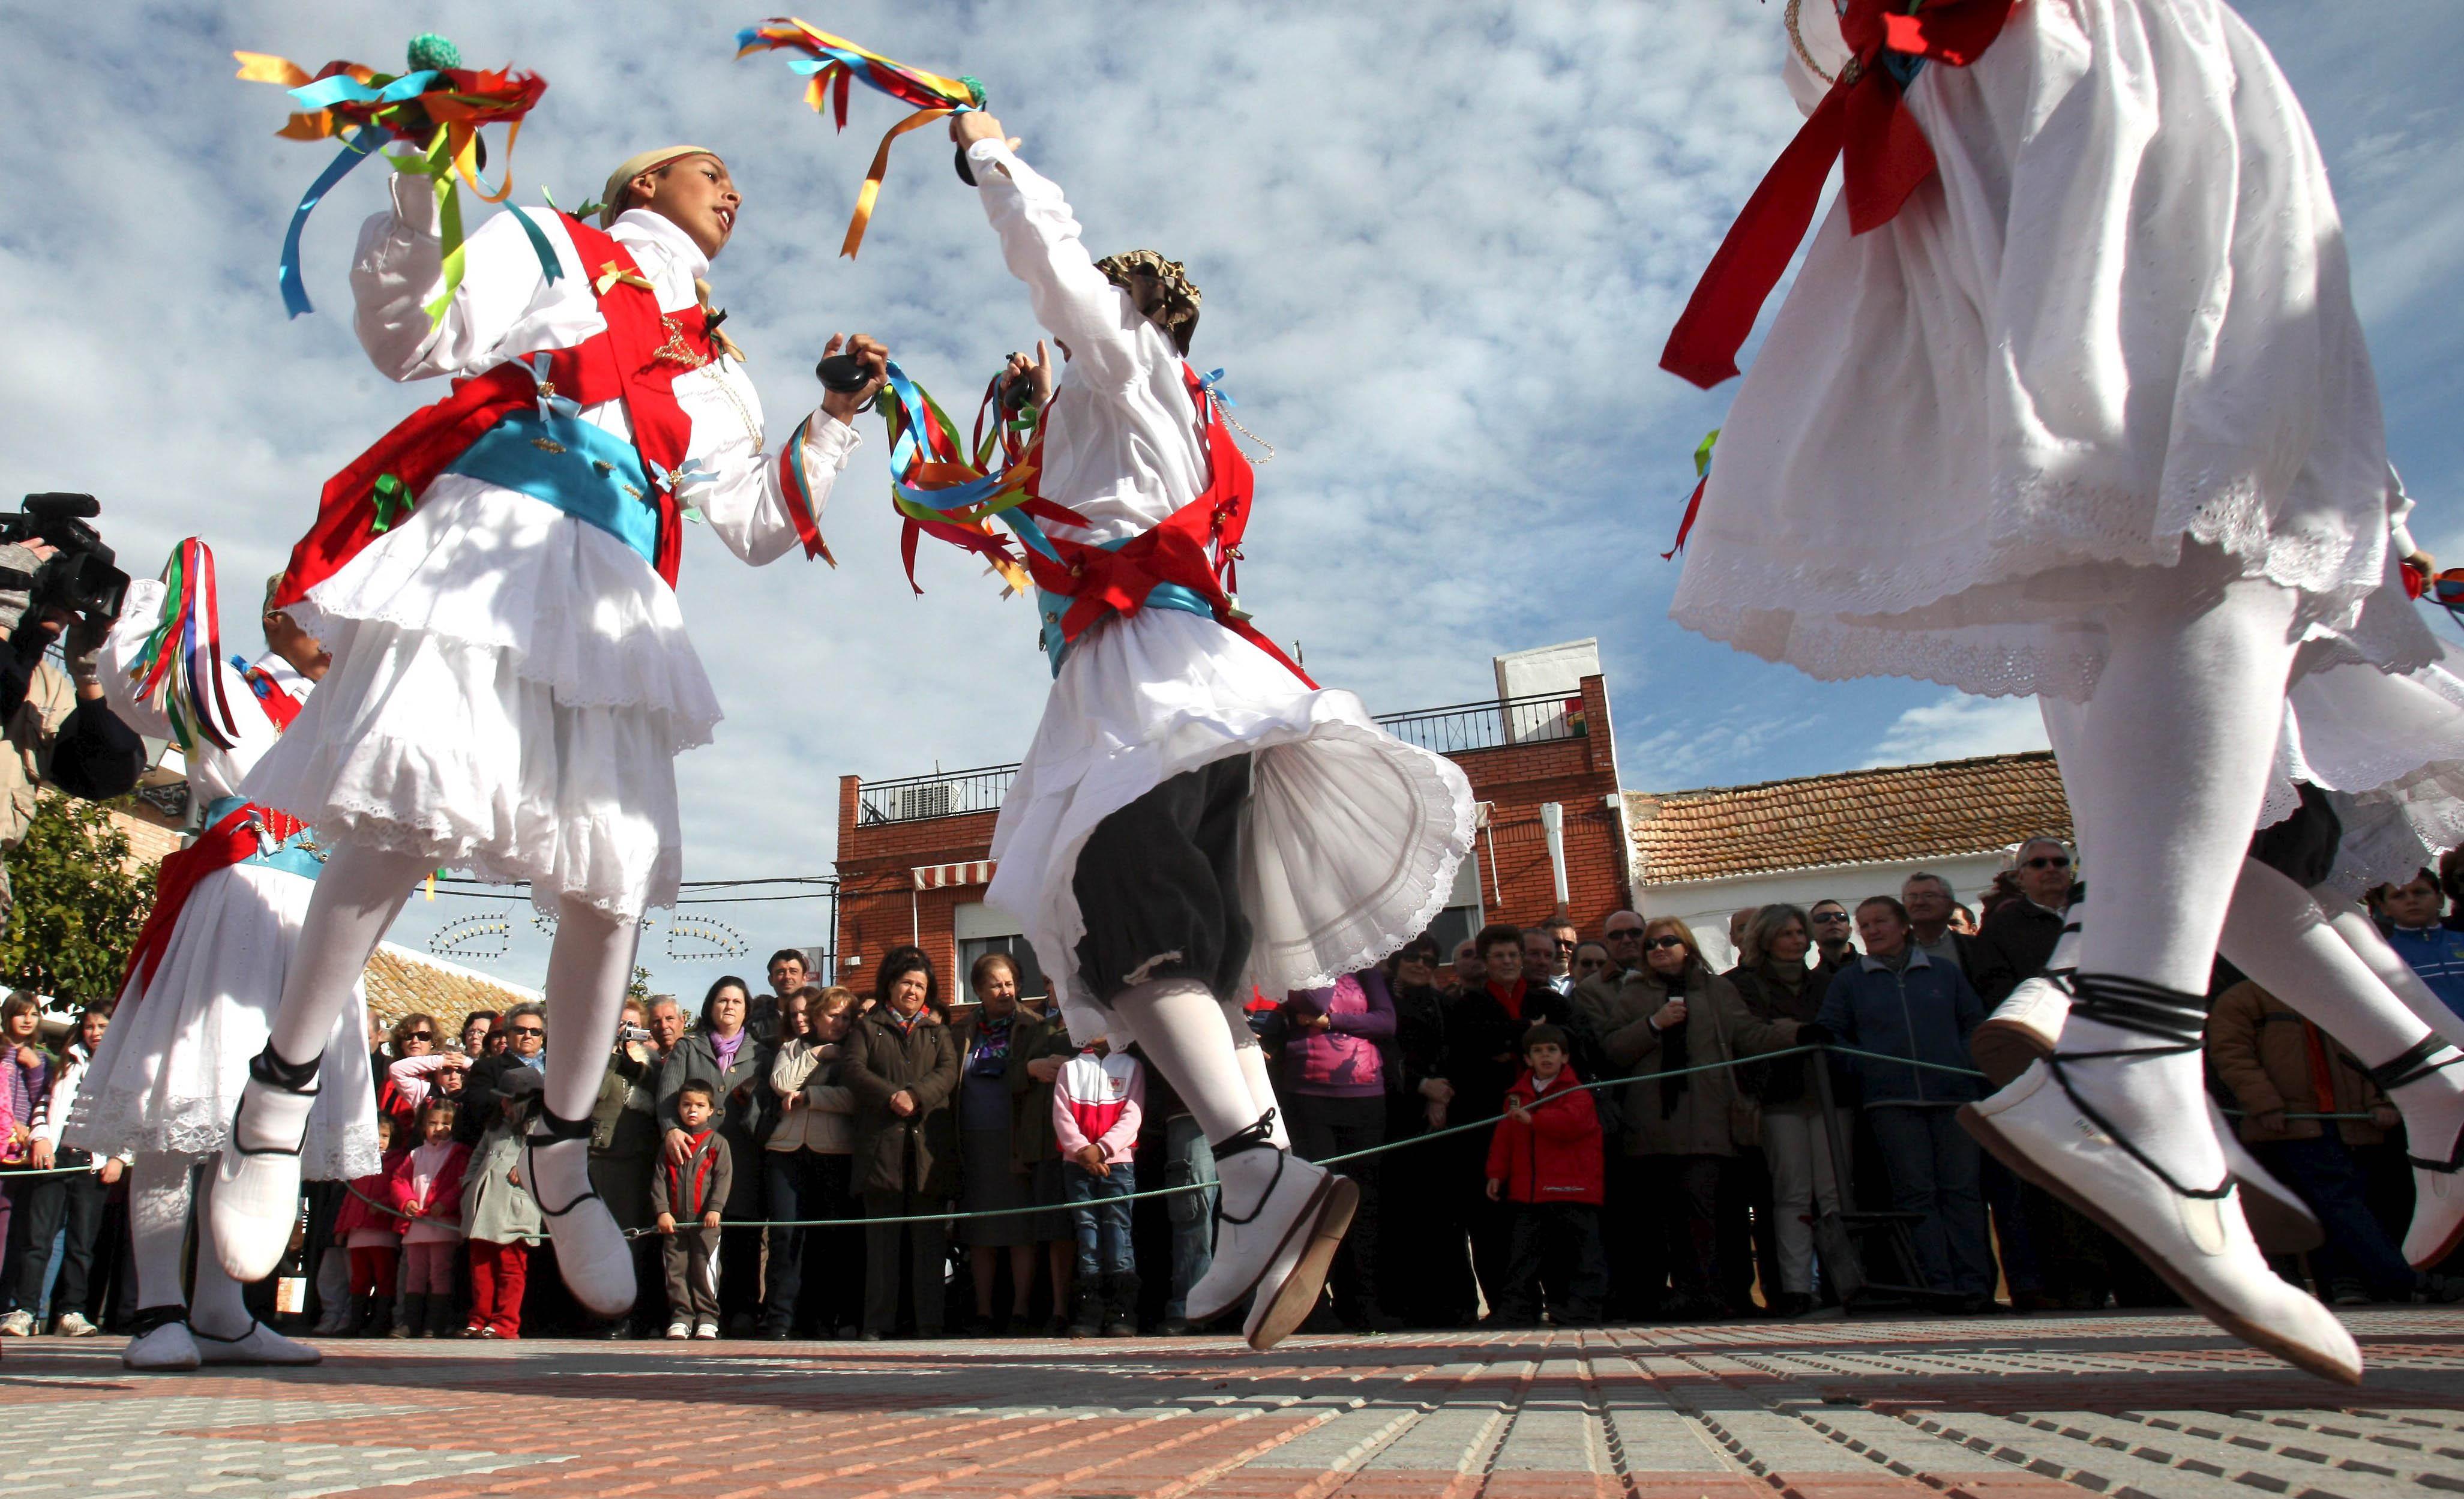 Baile en venezuela - 3 part 10